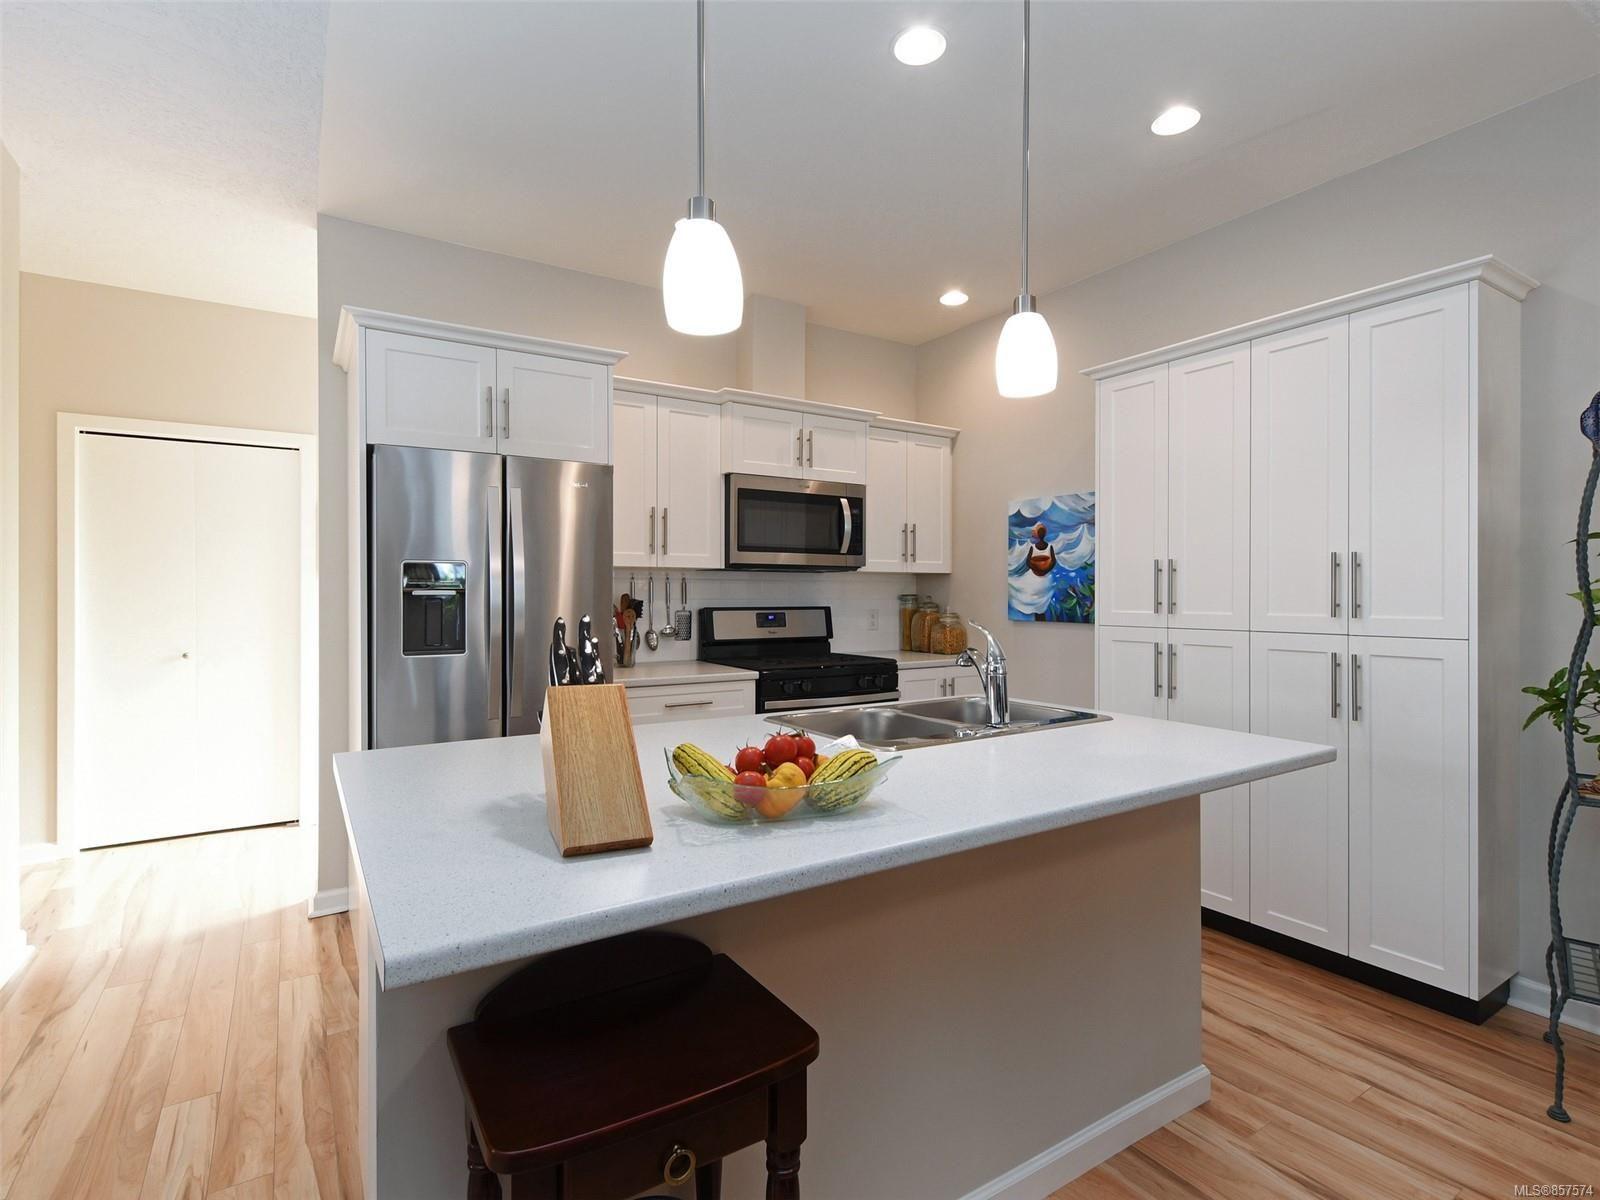 Photo 6: Photos: 6376 Shambrook Dr in : Sk Sunriver House for sale (Sooke)  : MLS®# 857574